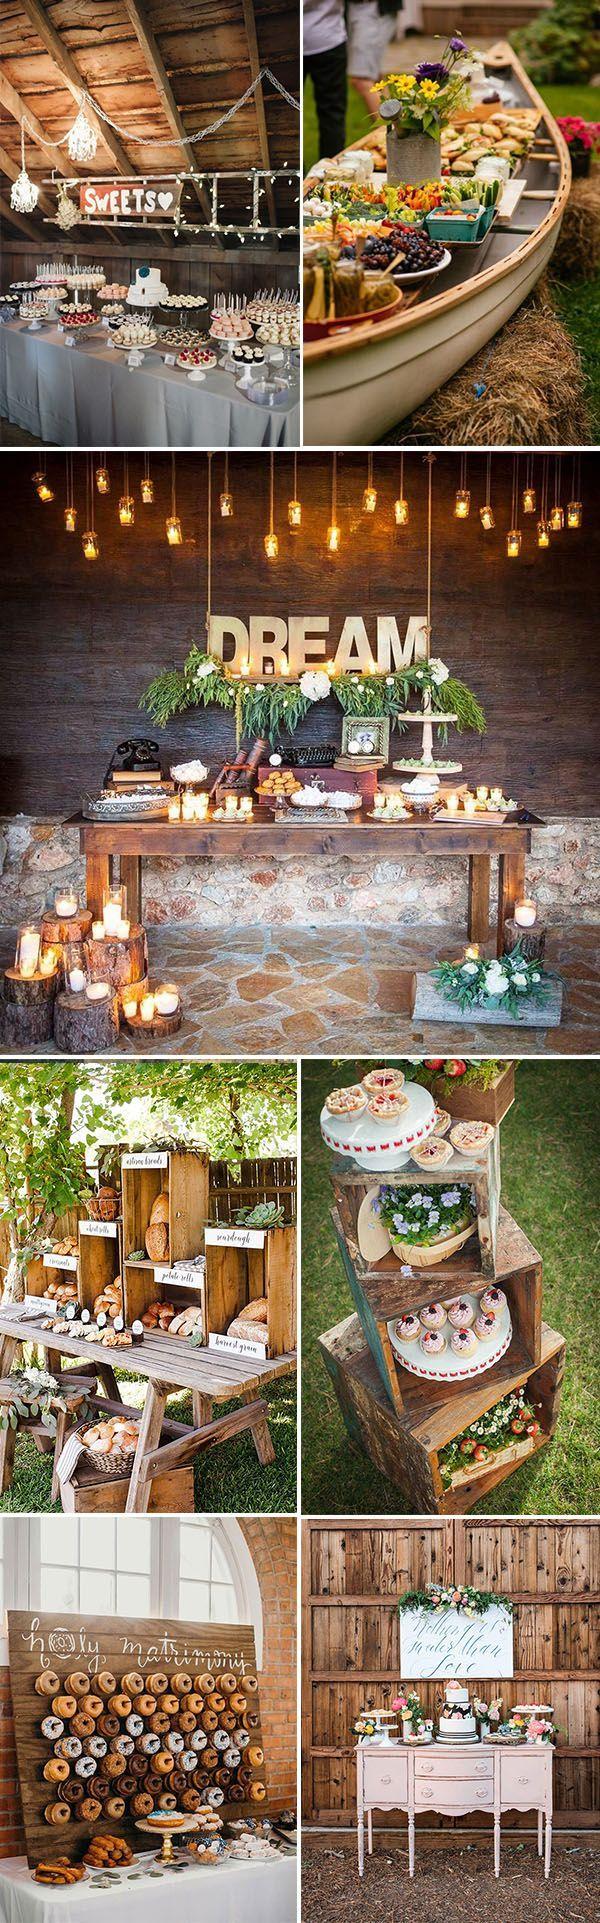 26 Inspiring Chic Wedding Food & Dessert Table Display ...